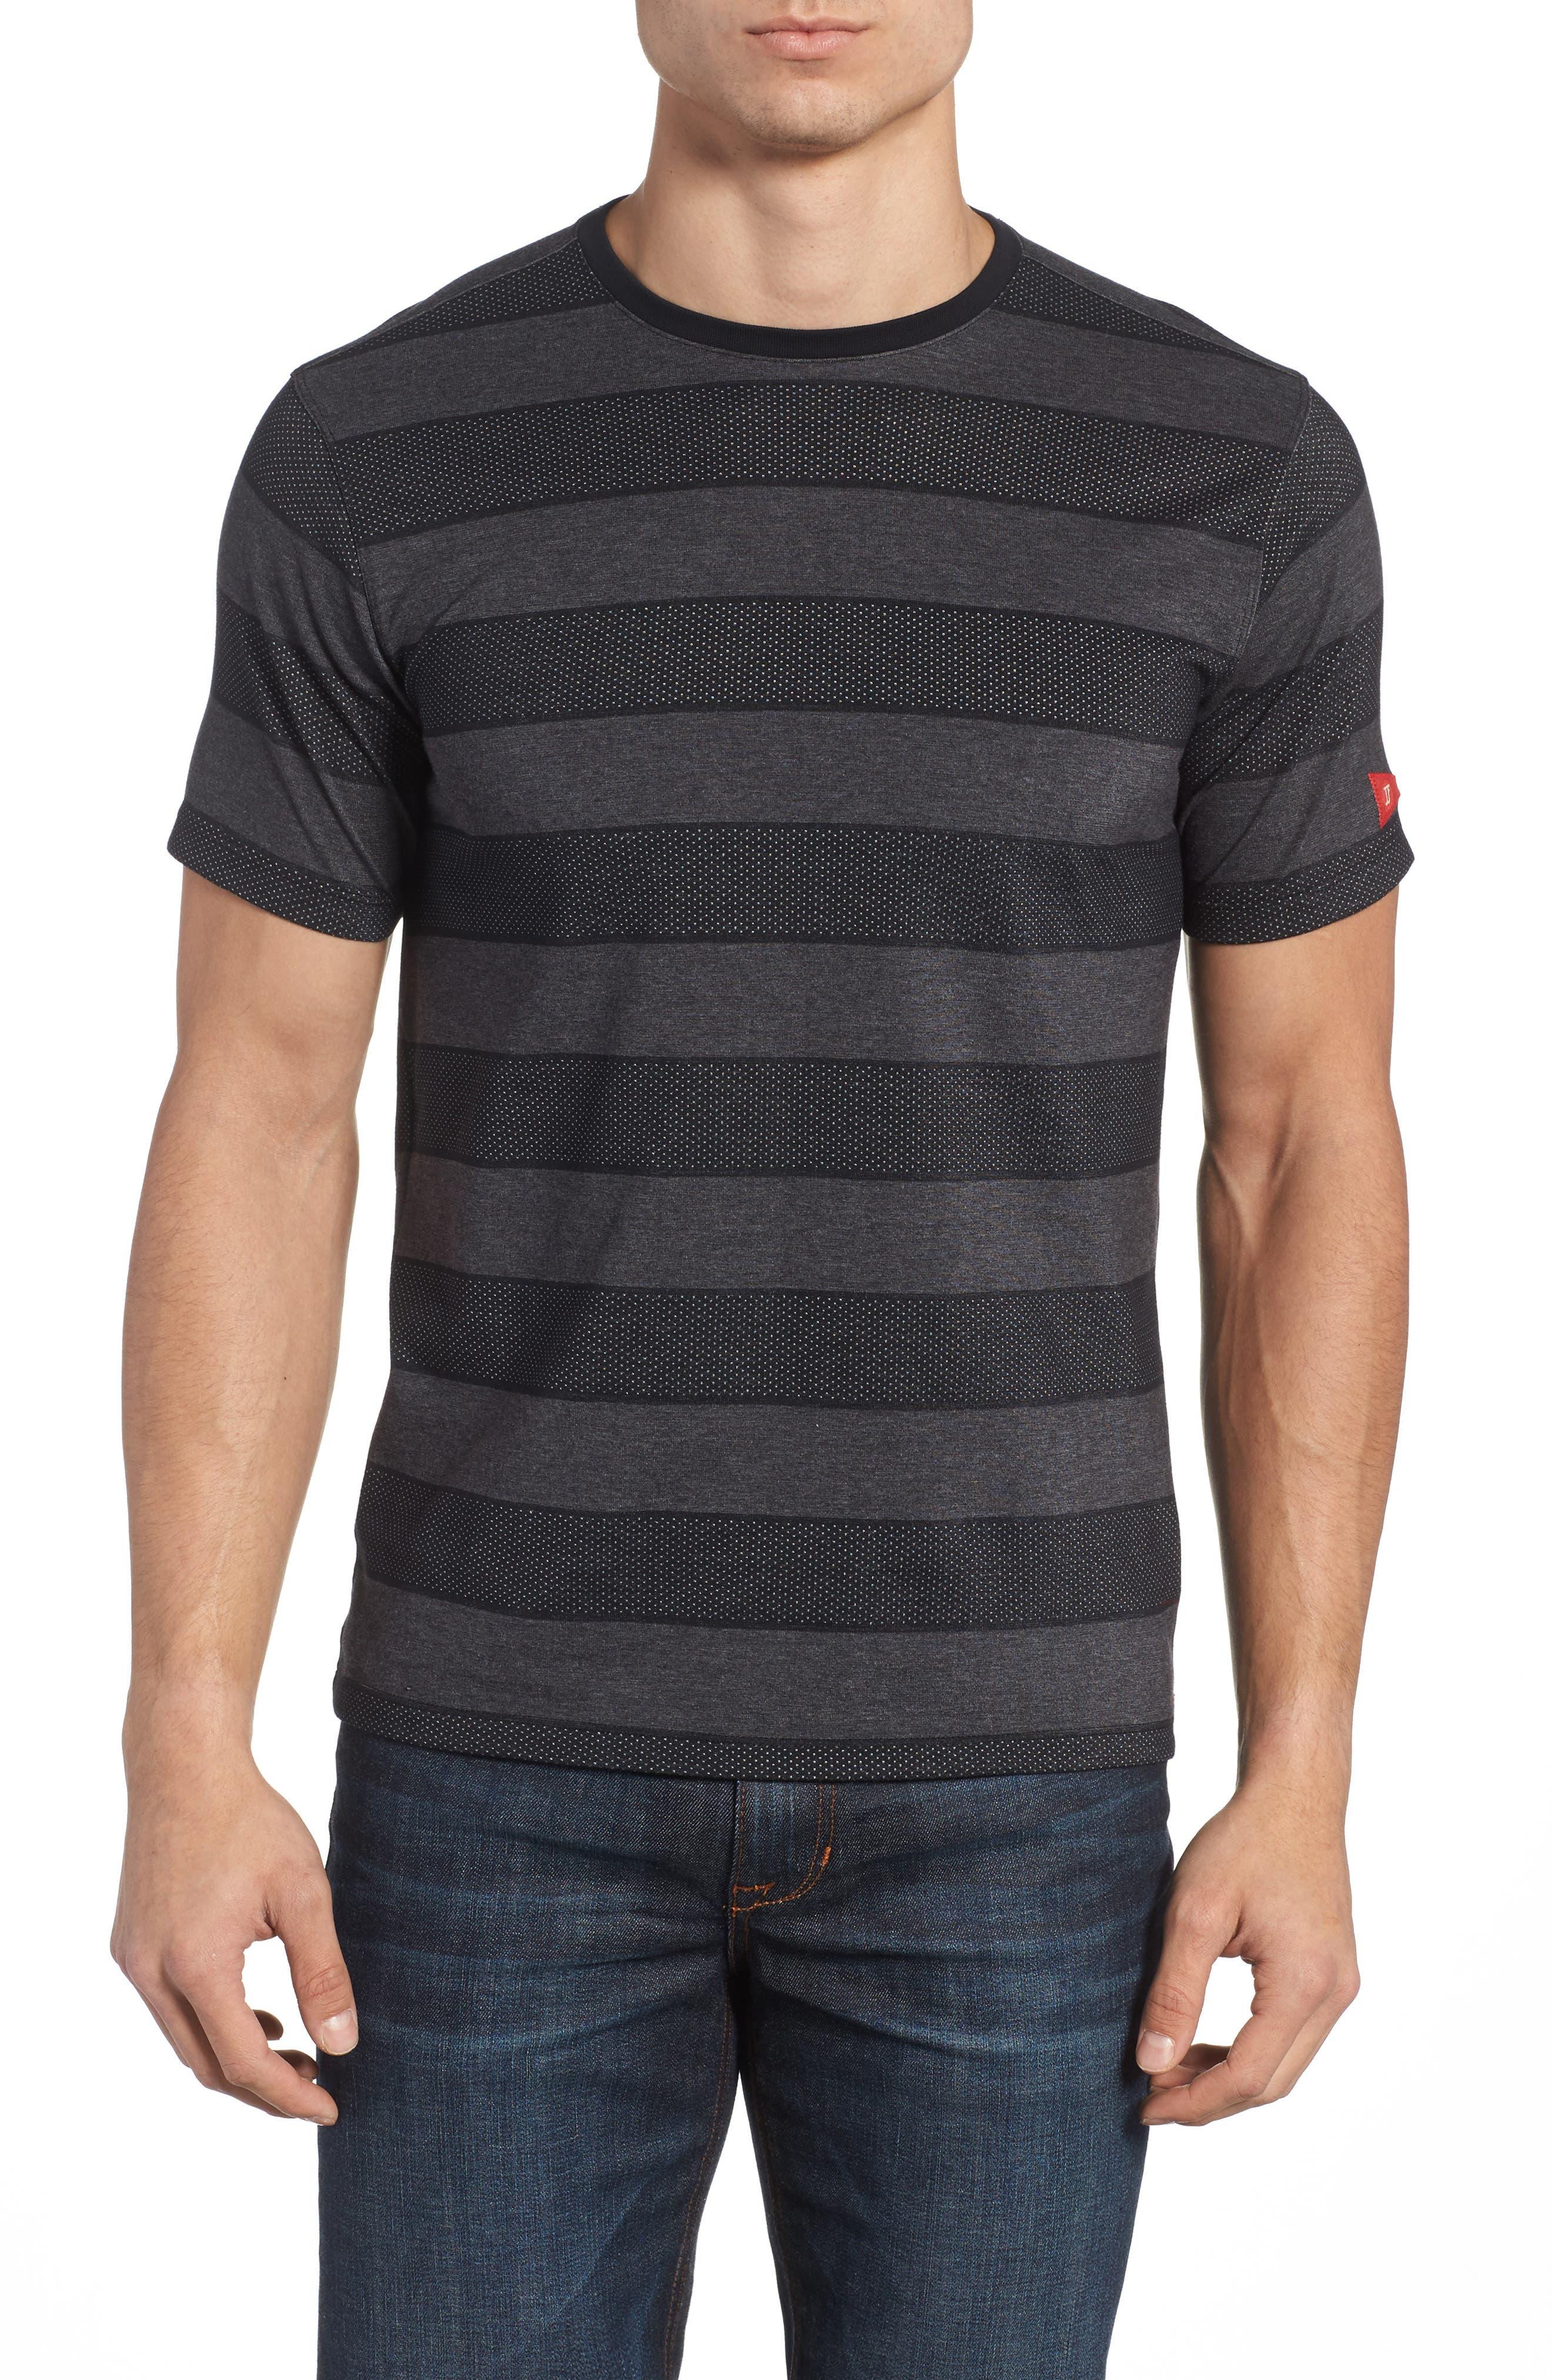 Regatta Dri-FIT T-Shirt,                         Main,                         color, Black